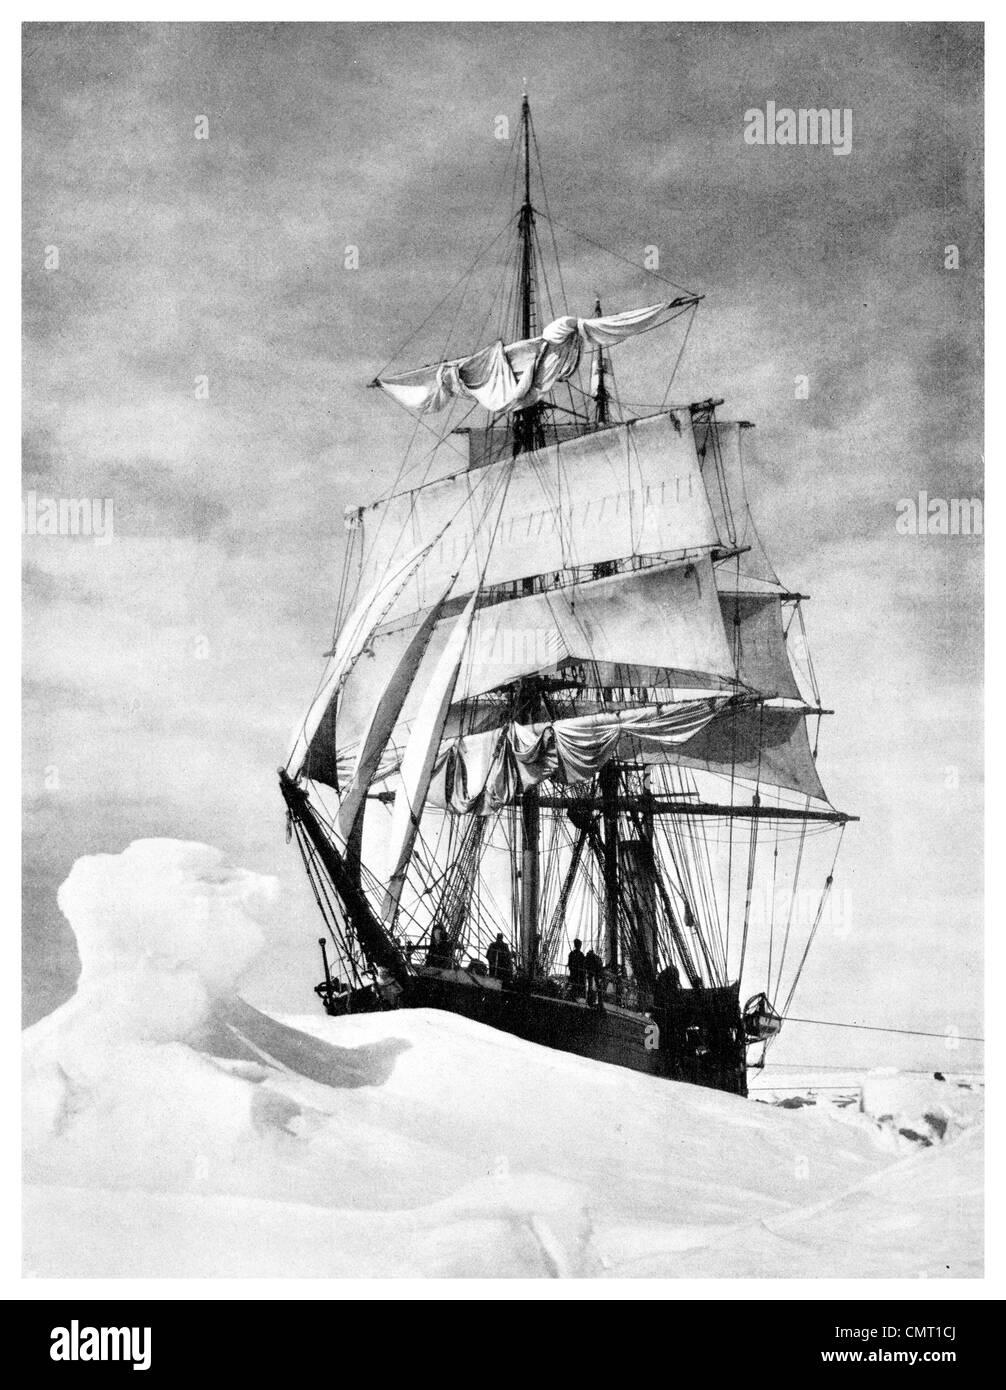 1924 El Explorador Polar Terra Nova del Capitán Scott Expedición Terra Nova, oficialmente la Expedición Imagen De Stock